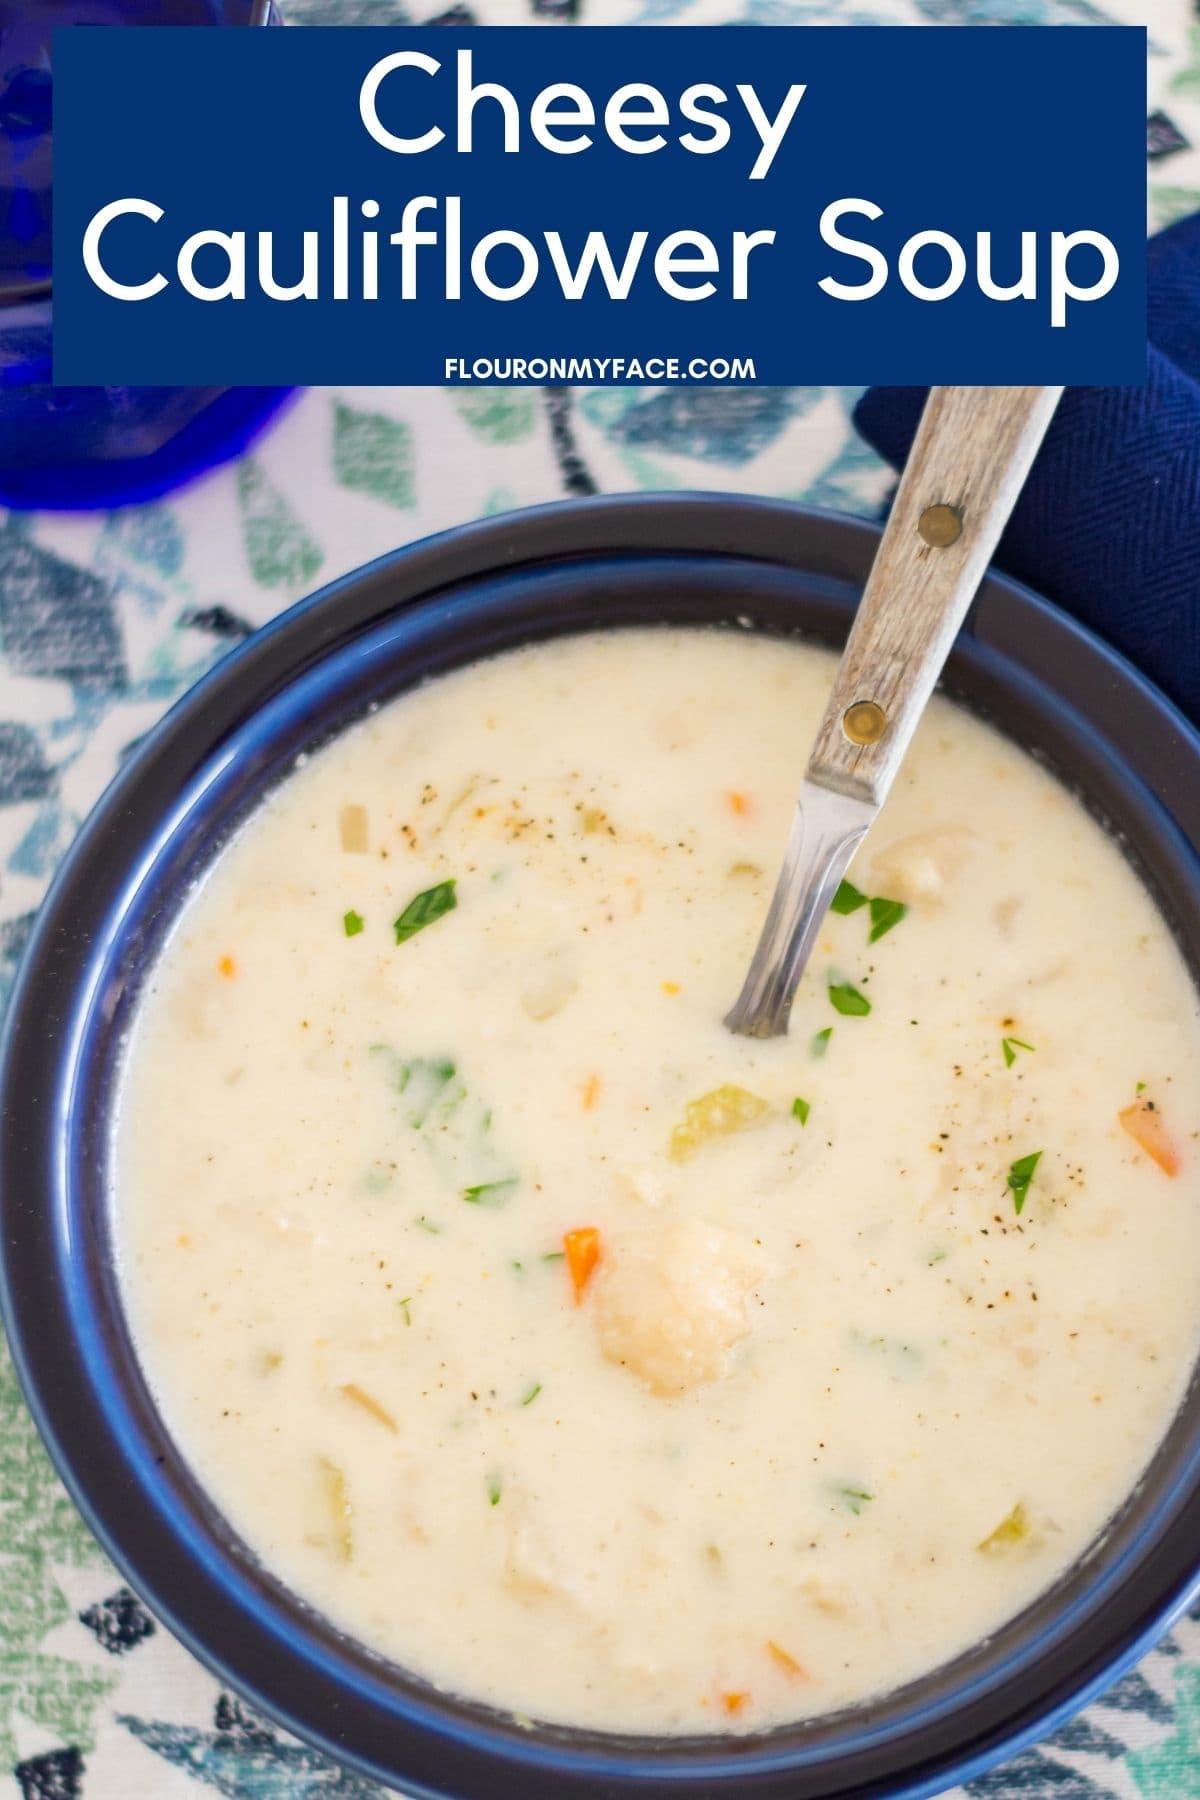 Close up of a bowl of cauliflower soup.